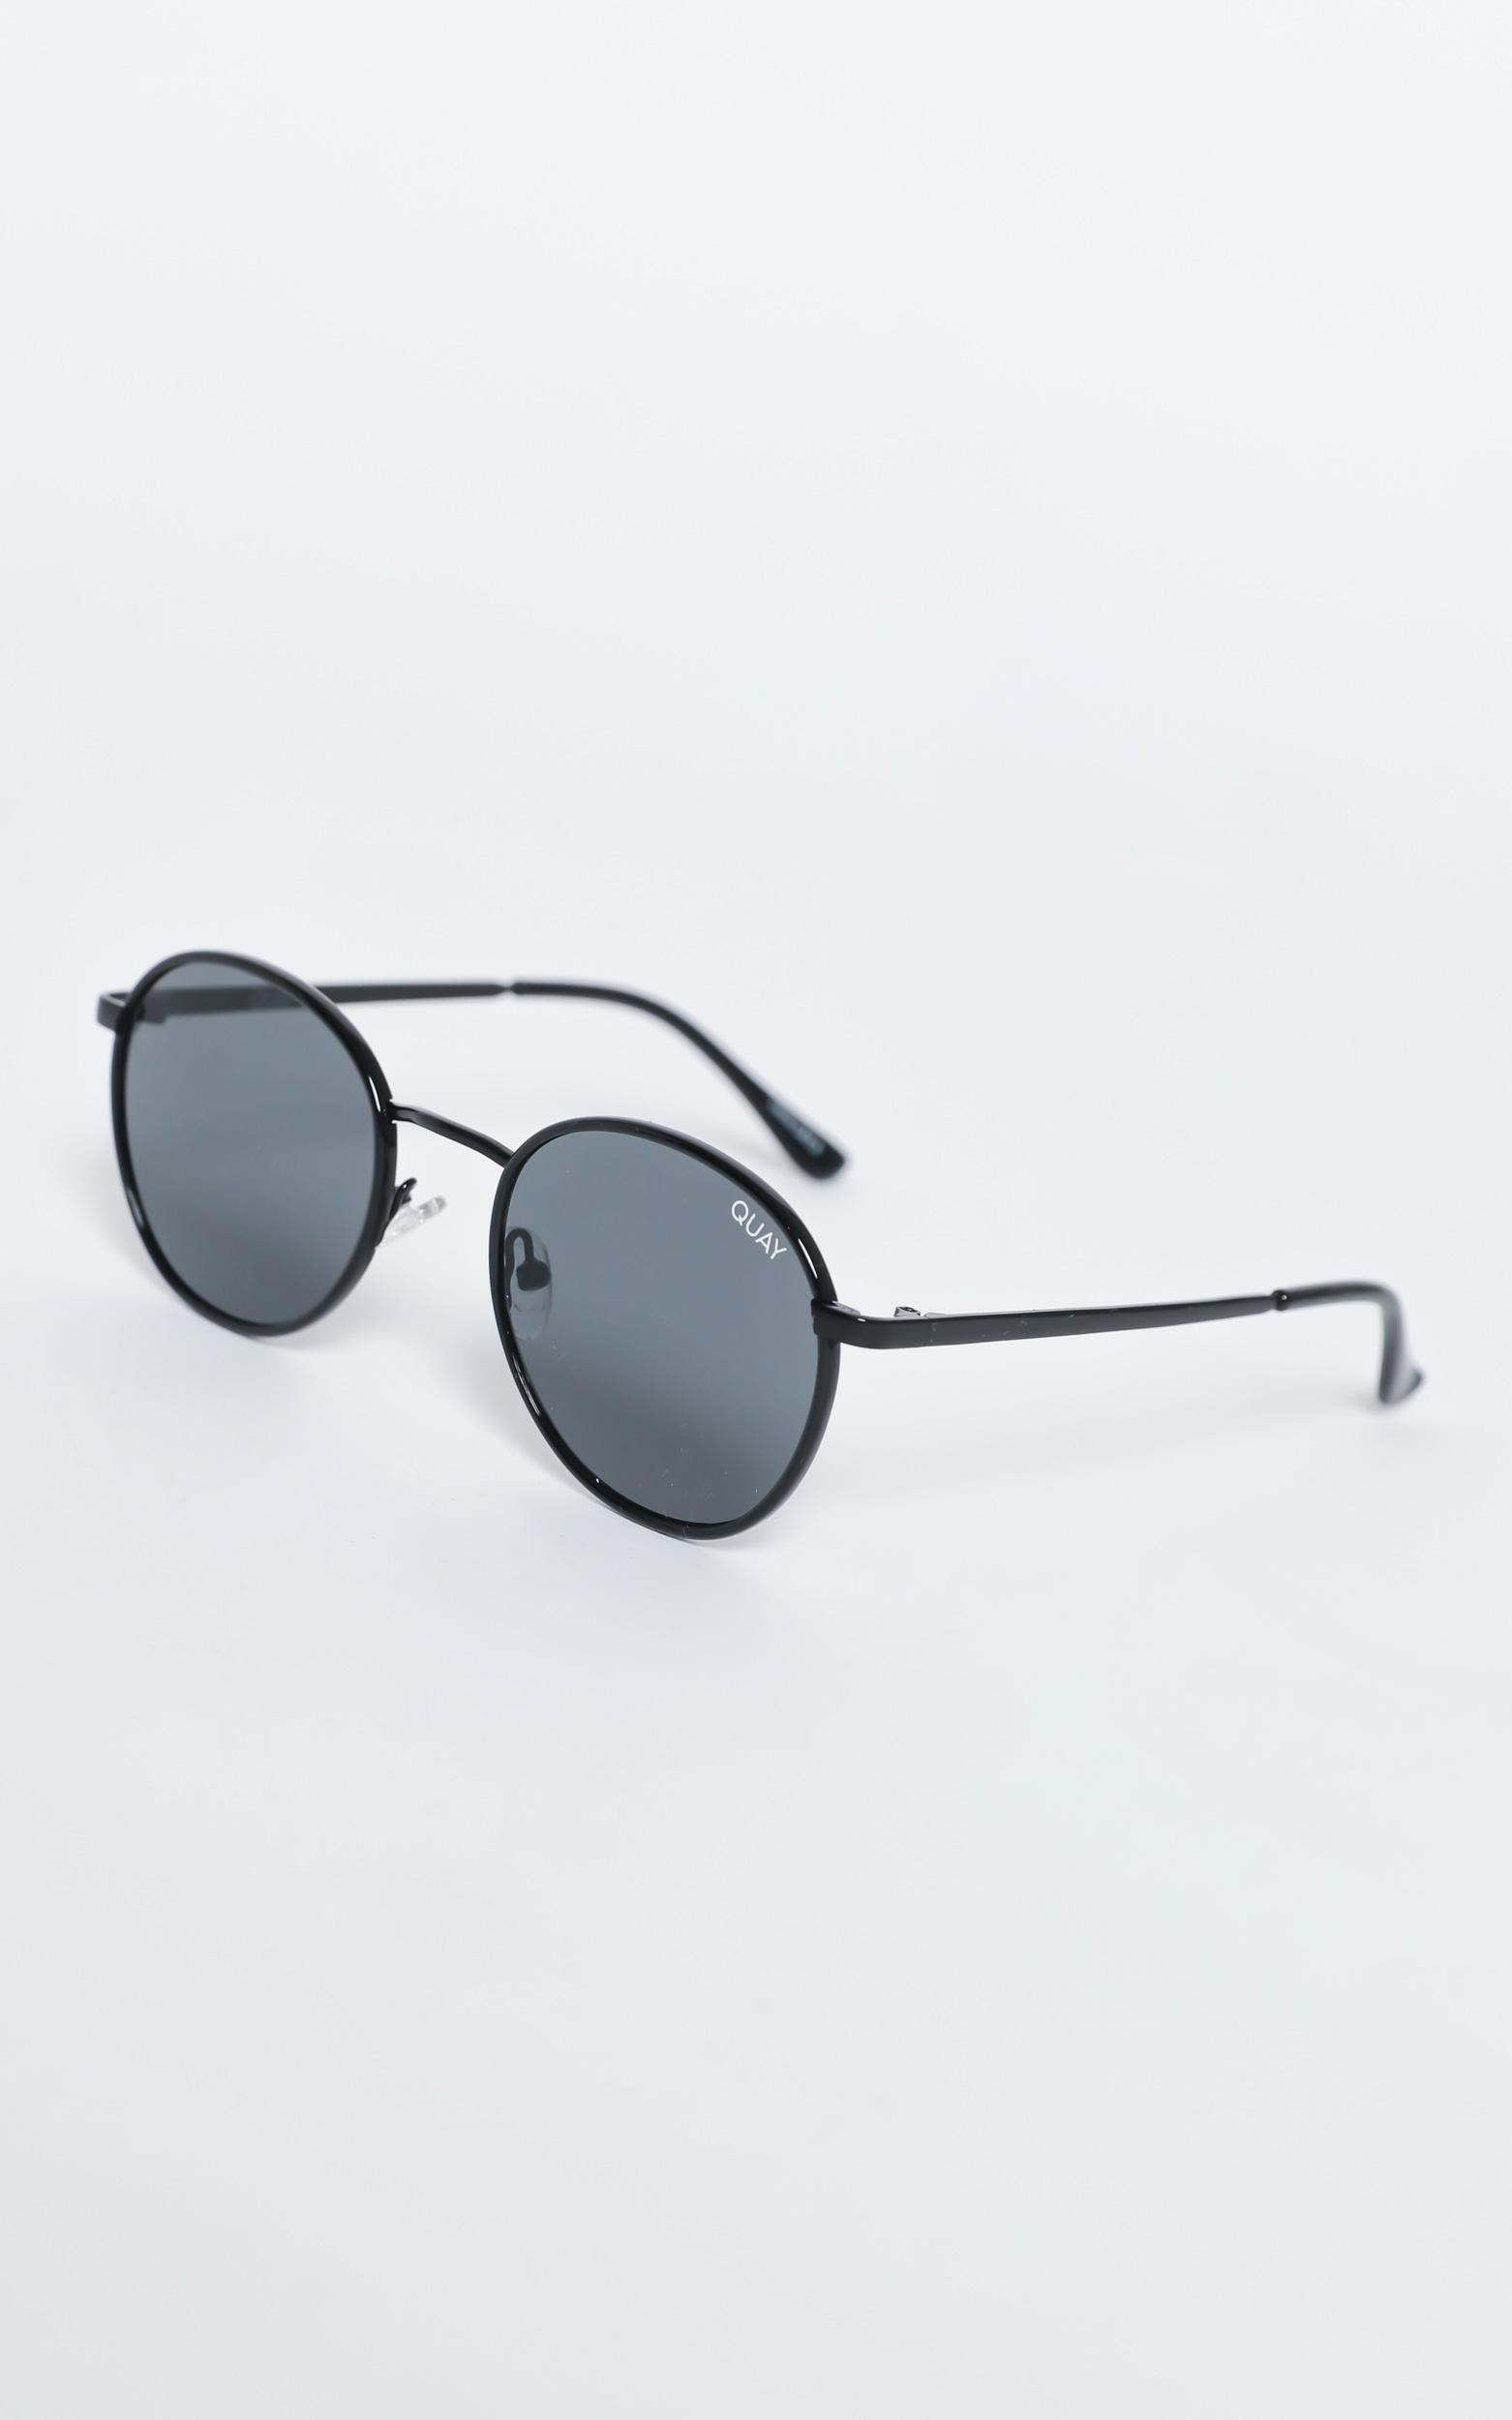 Quay - Omen Sunglasses in Black / Smoke, , hi-res image number null